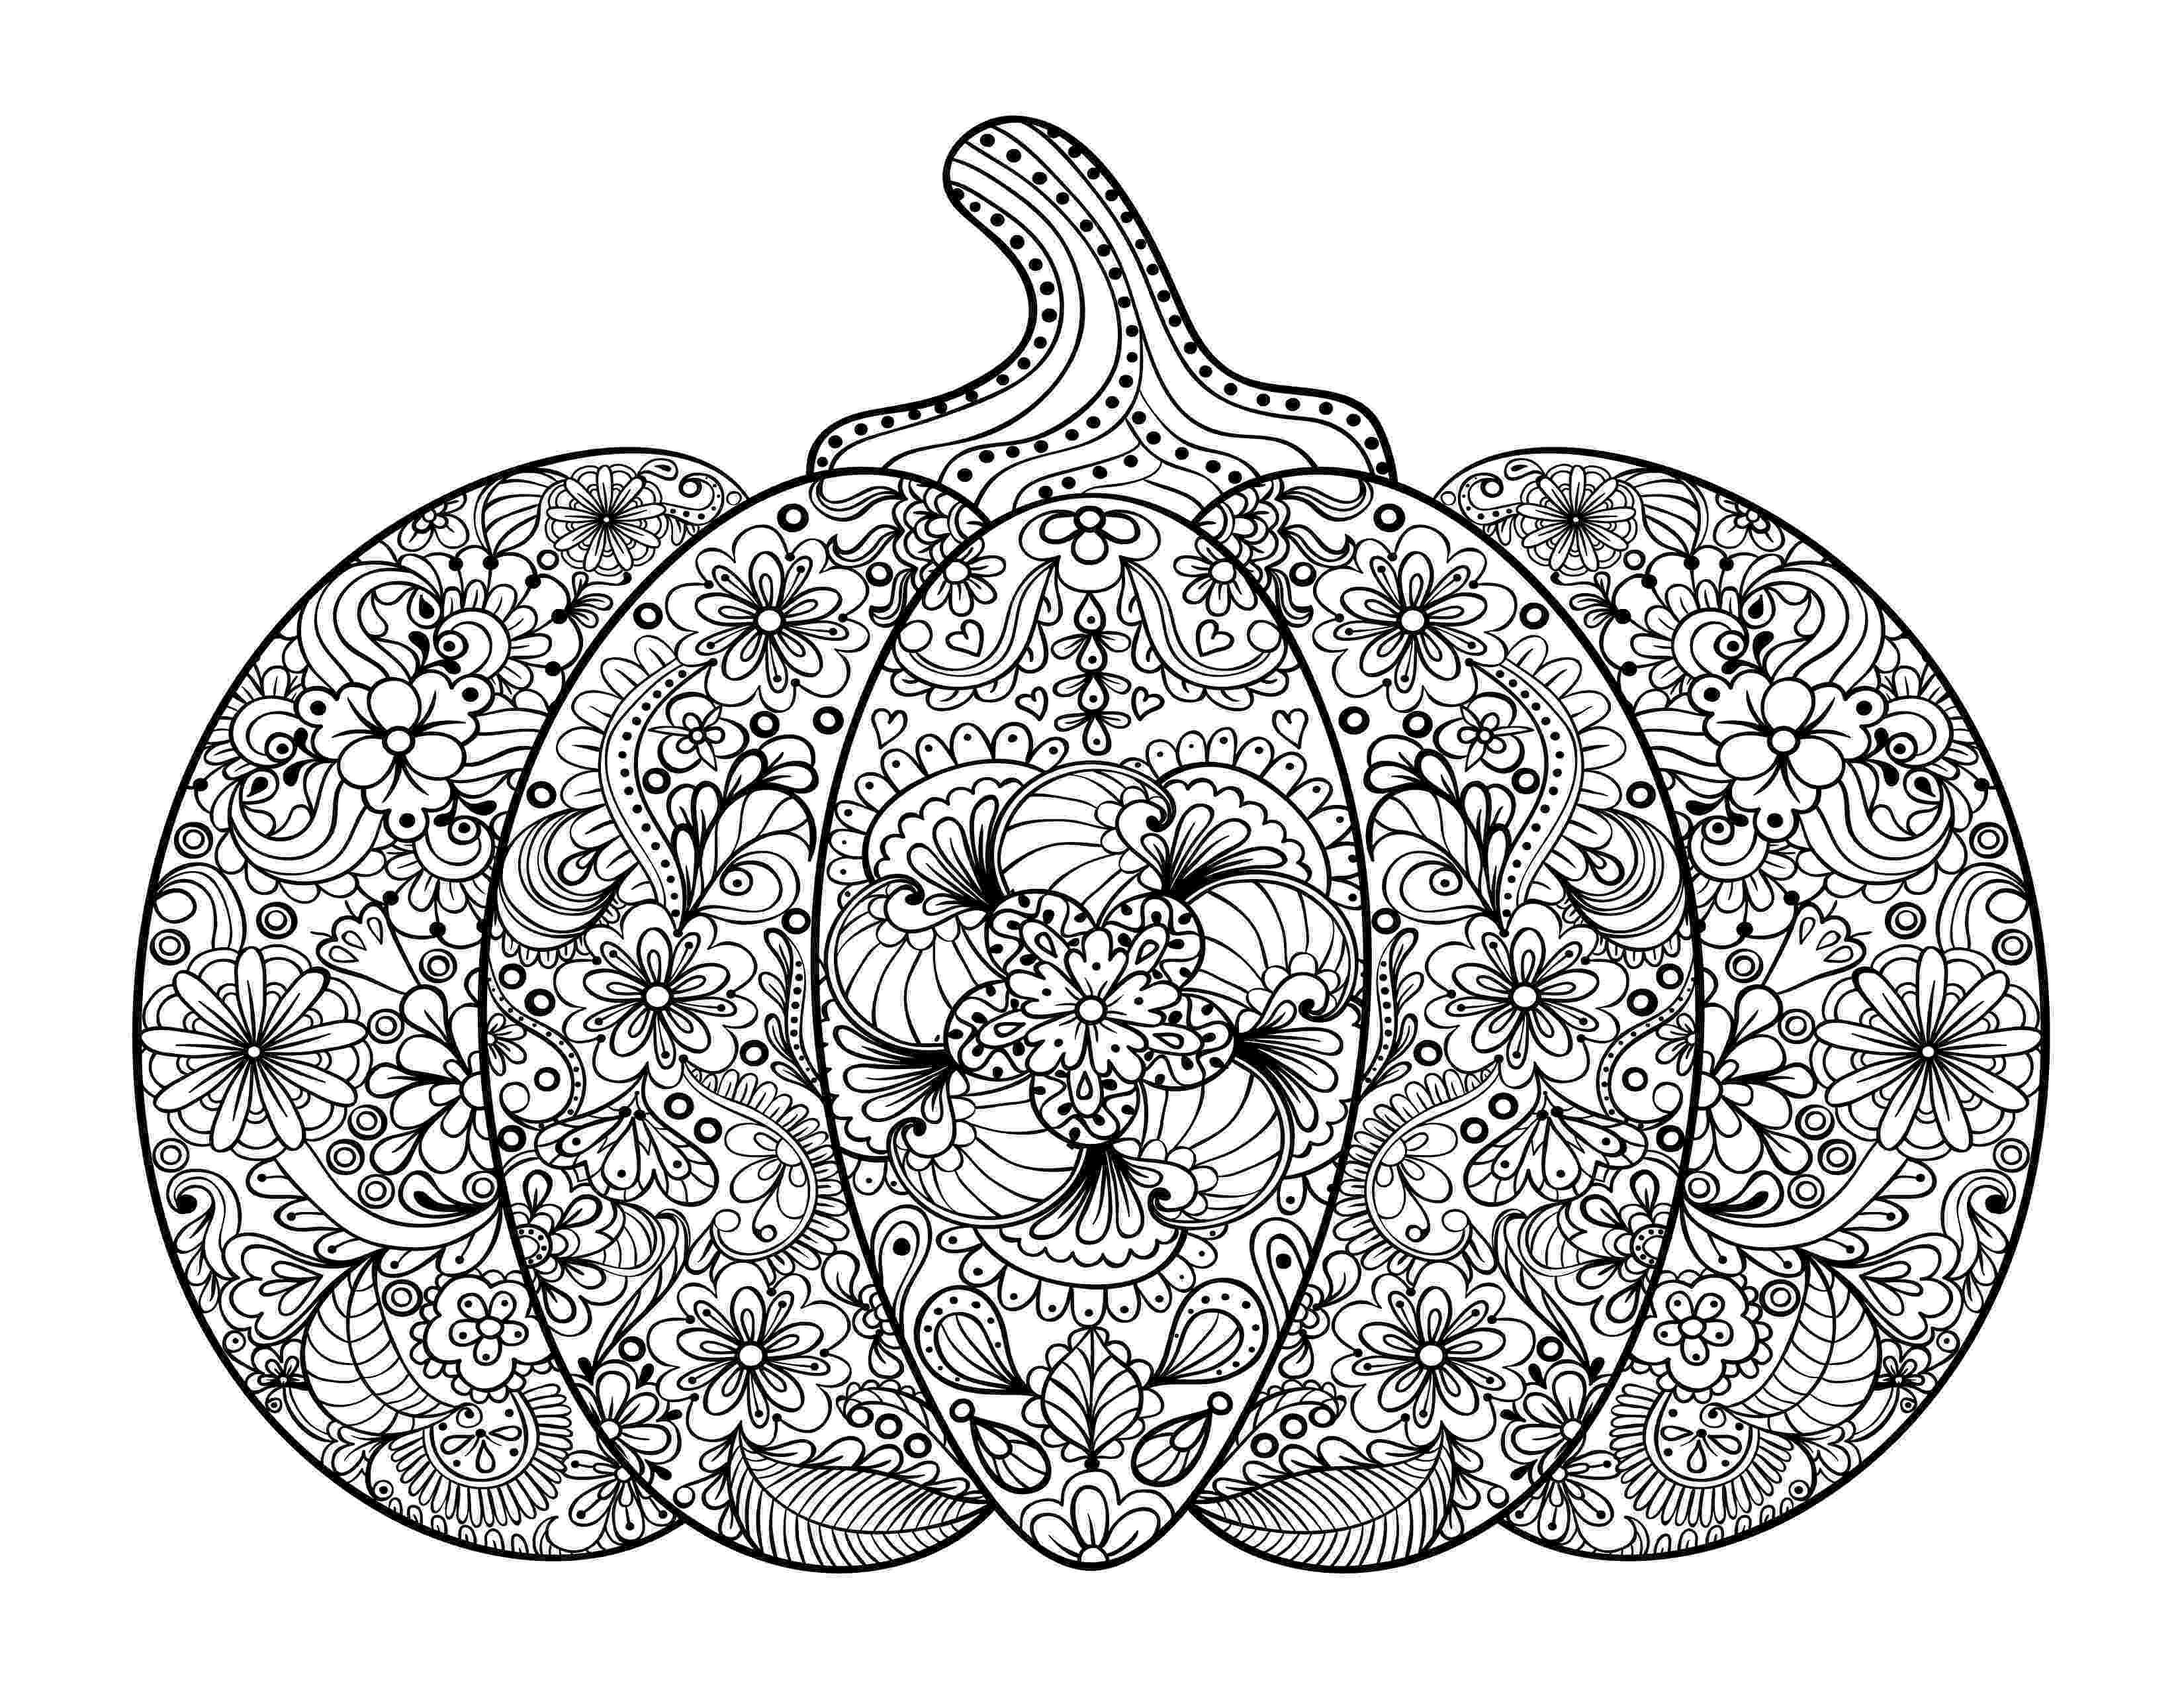 pumpkins coloring page pumpkin coloring pages getcoloringpagescom pumpkins coloring page